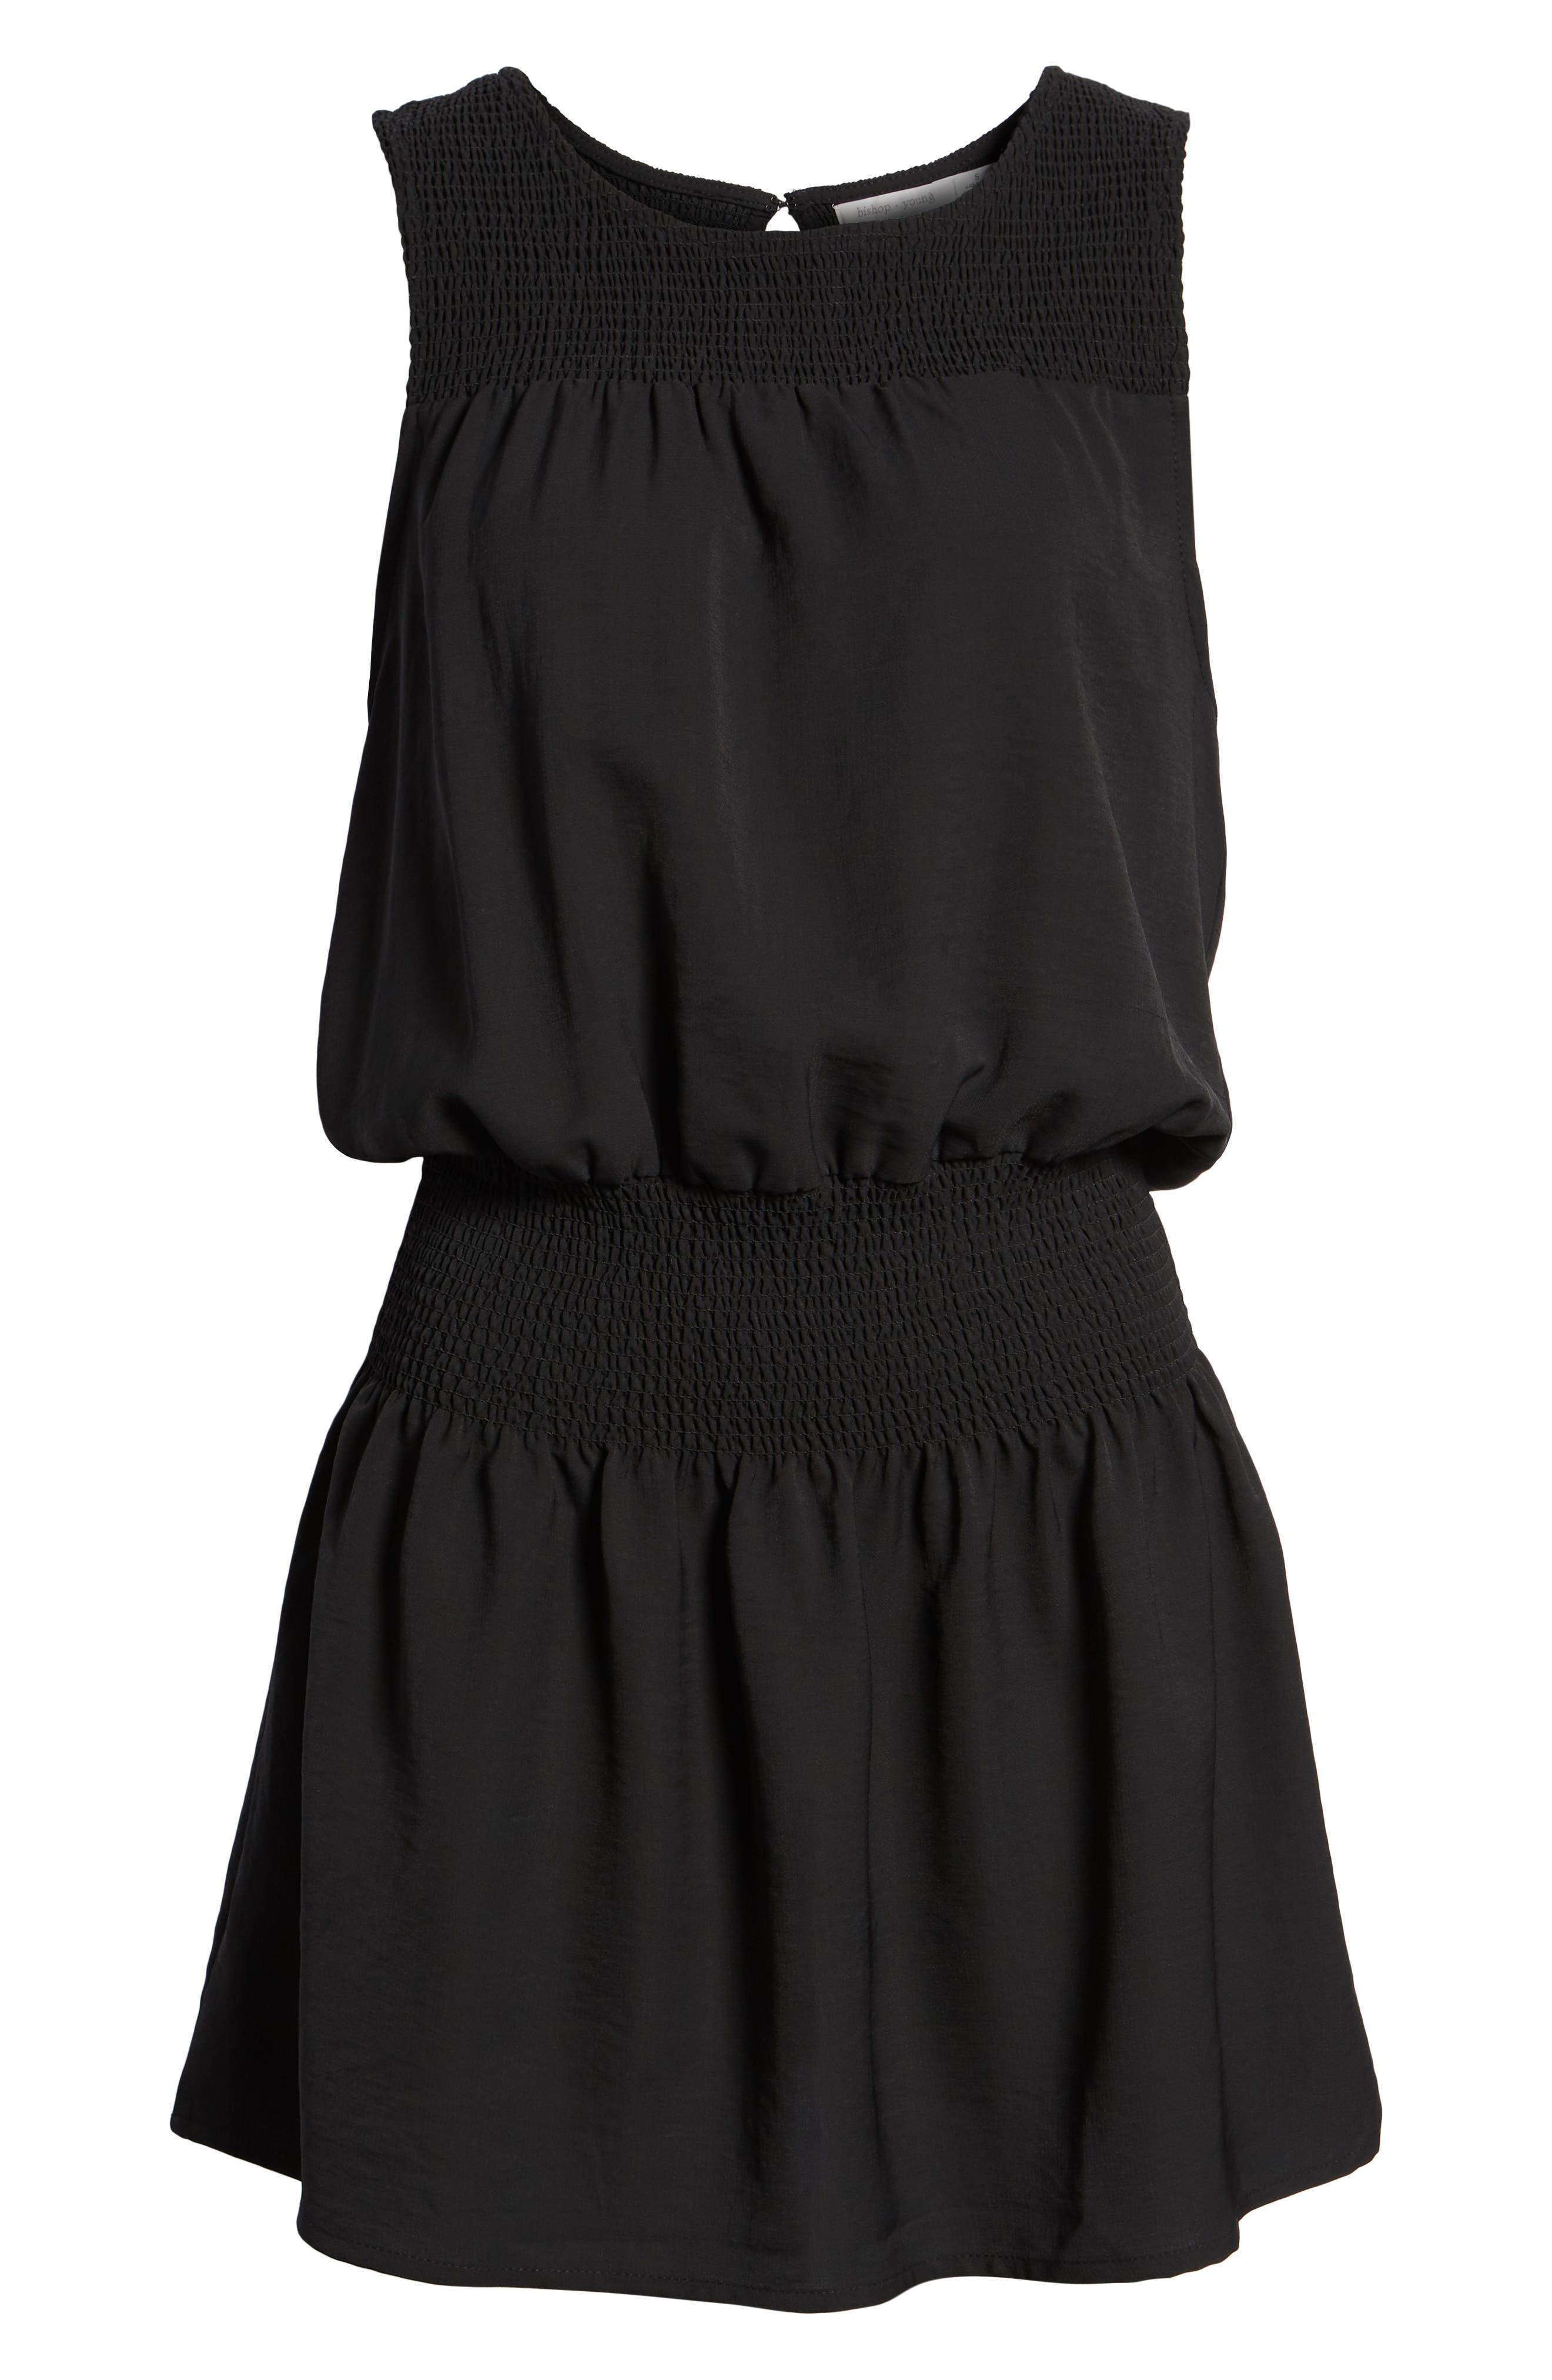 Bishop + Young Smocked Dress,                             Alternate thumbnail 7, color,                             BLACK